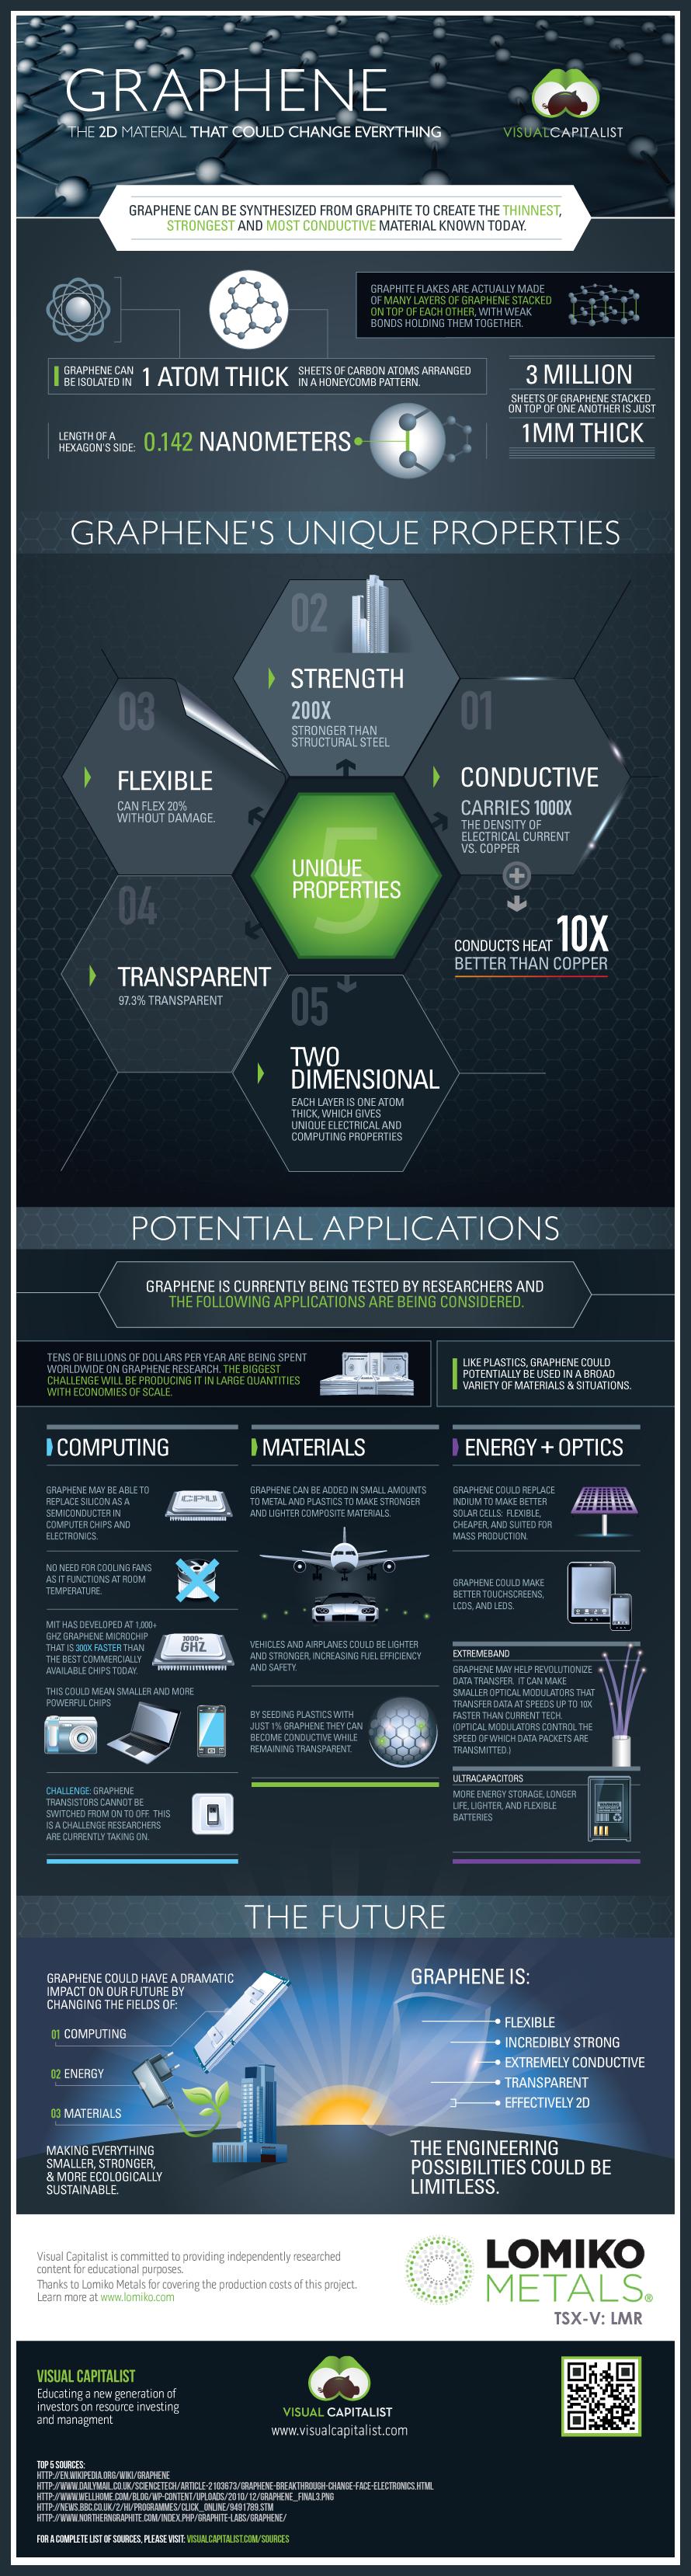 Graphene Infographic IoT